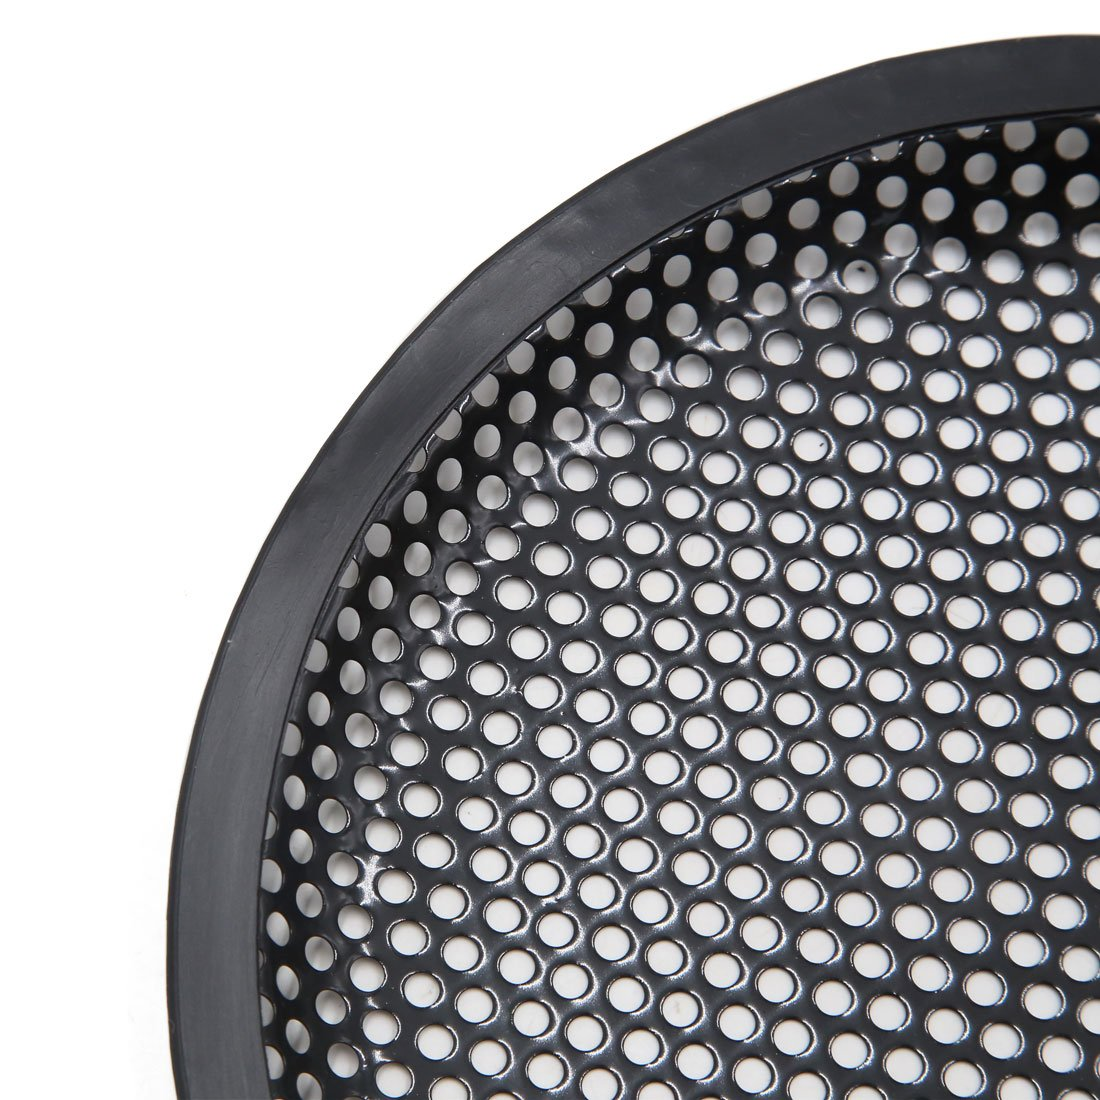 8Dmr schwarz Metall Gitter Auto Audio Lautsprecher Subwoofer Staub Schutz DE de sourcingmap/® 2Stk